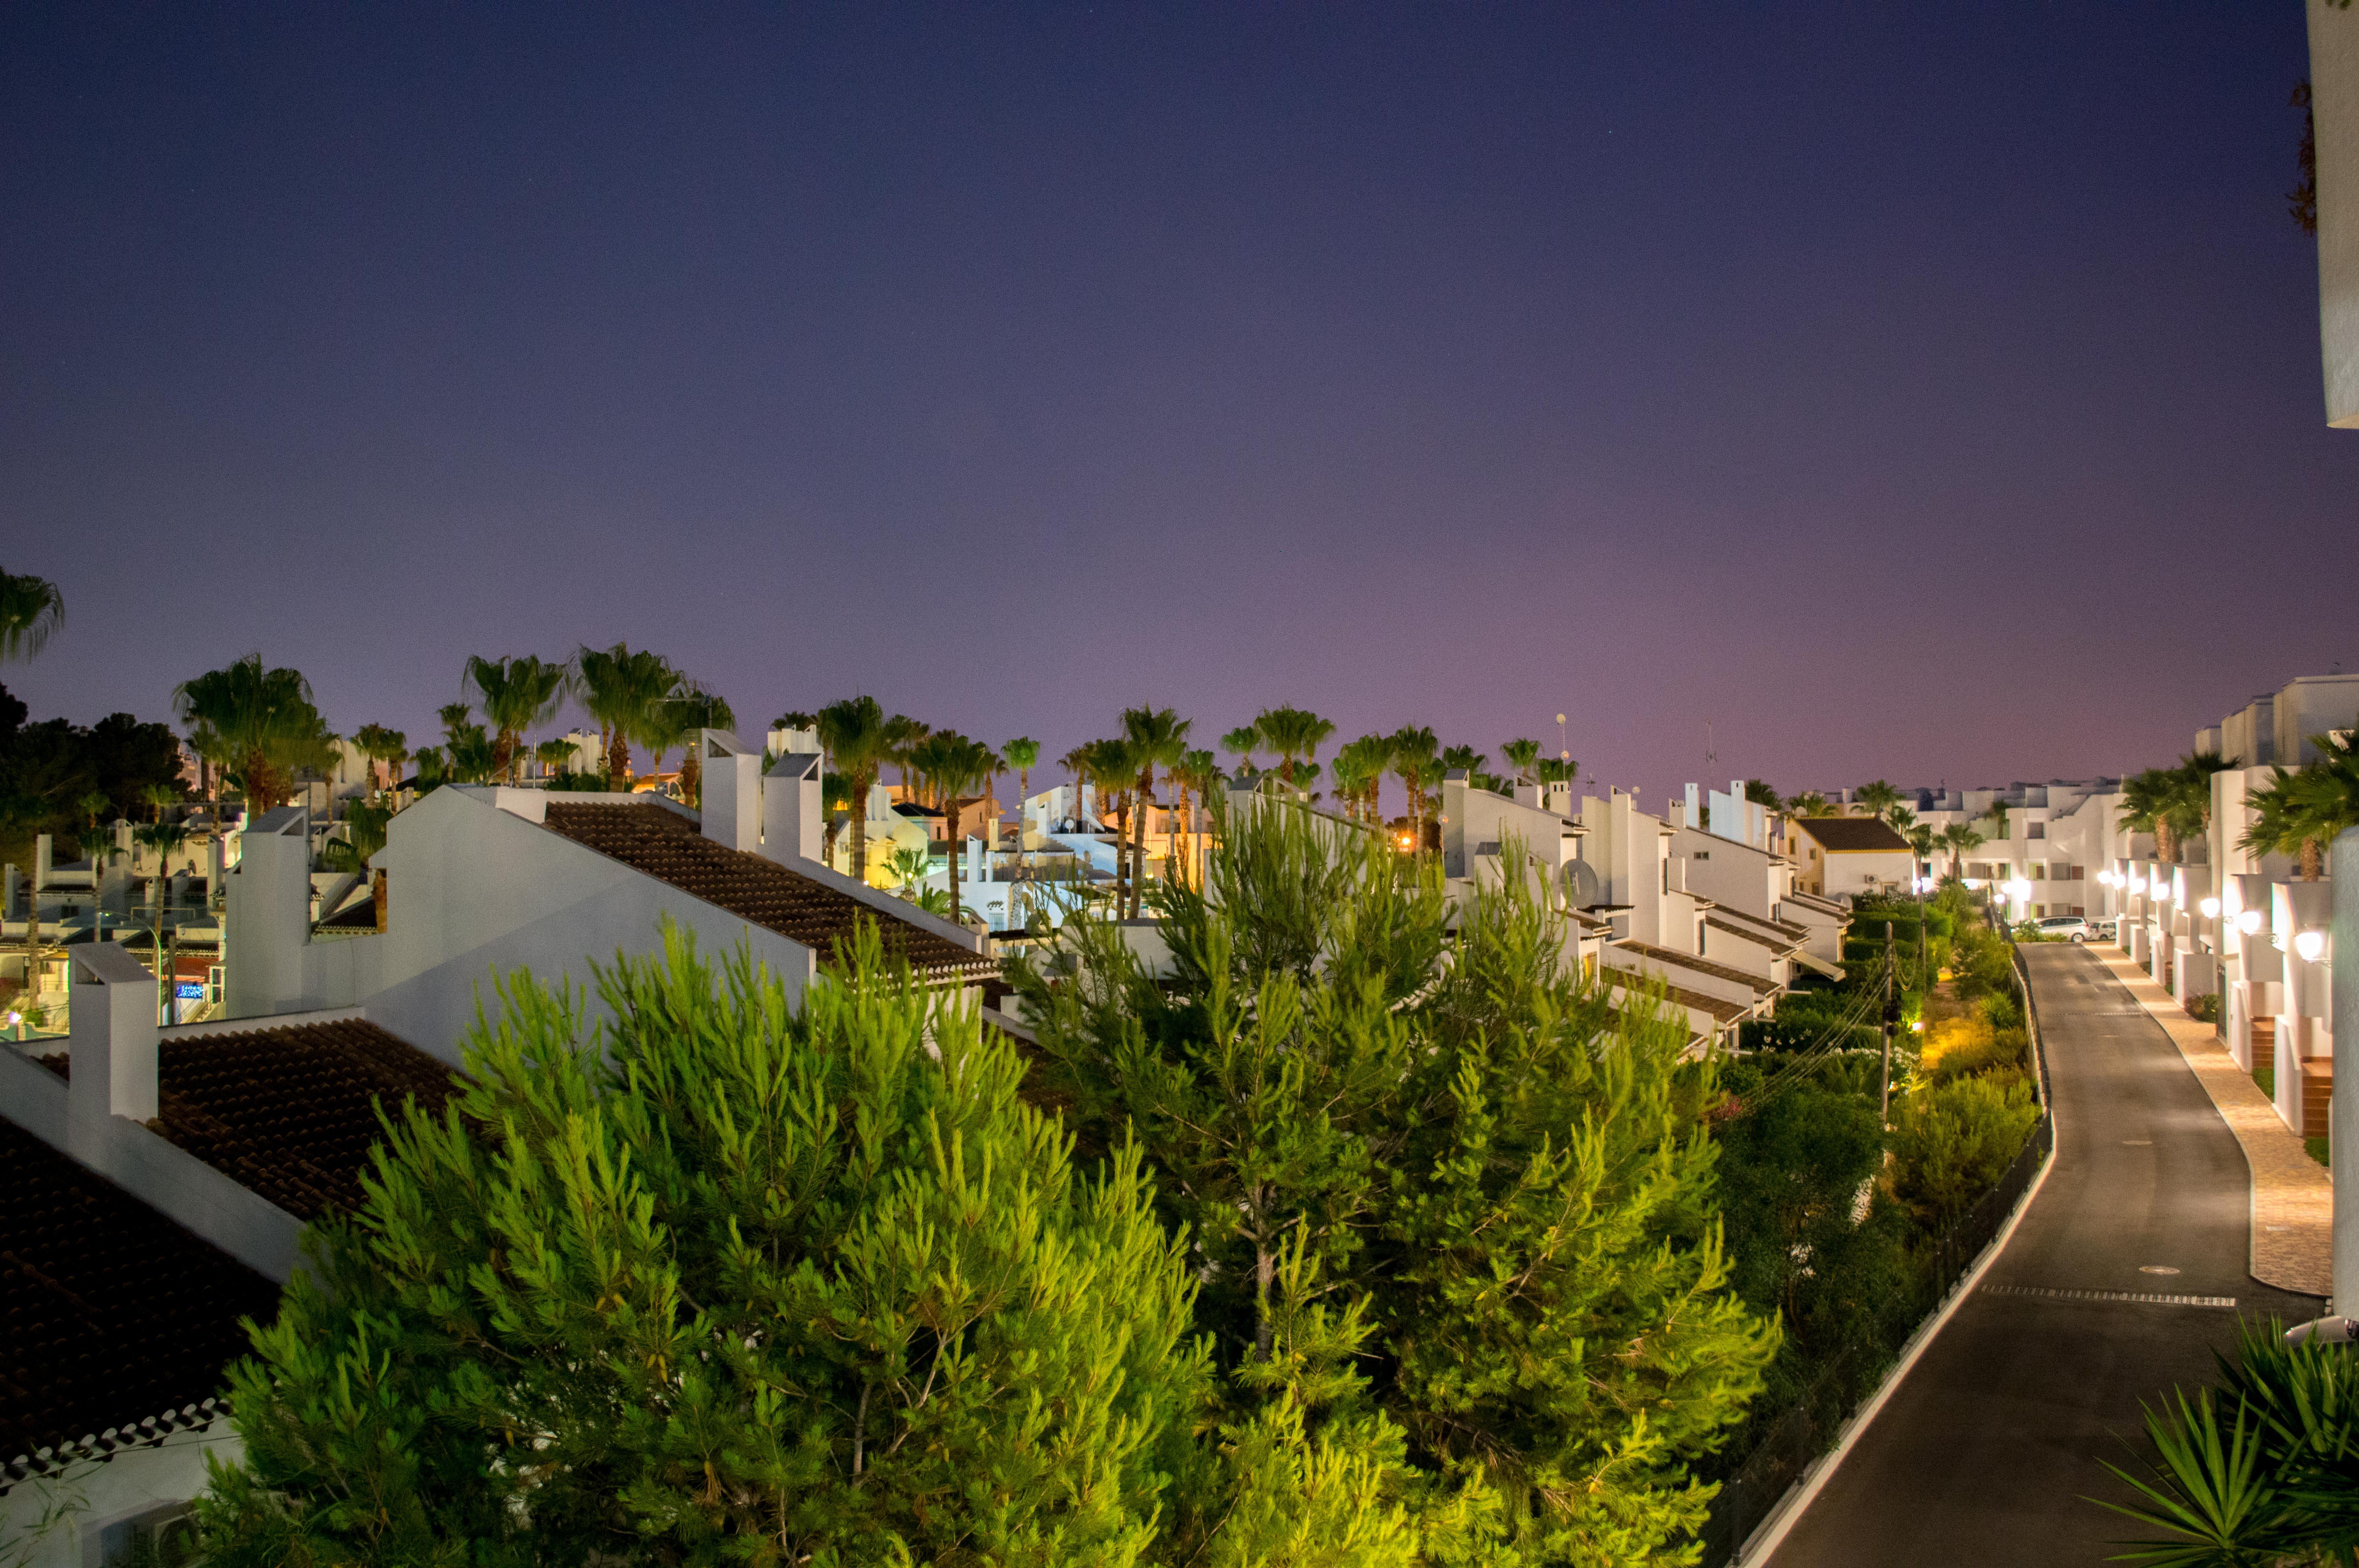 Nattbilde i byen